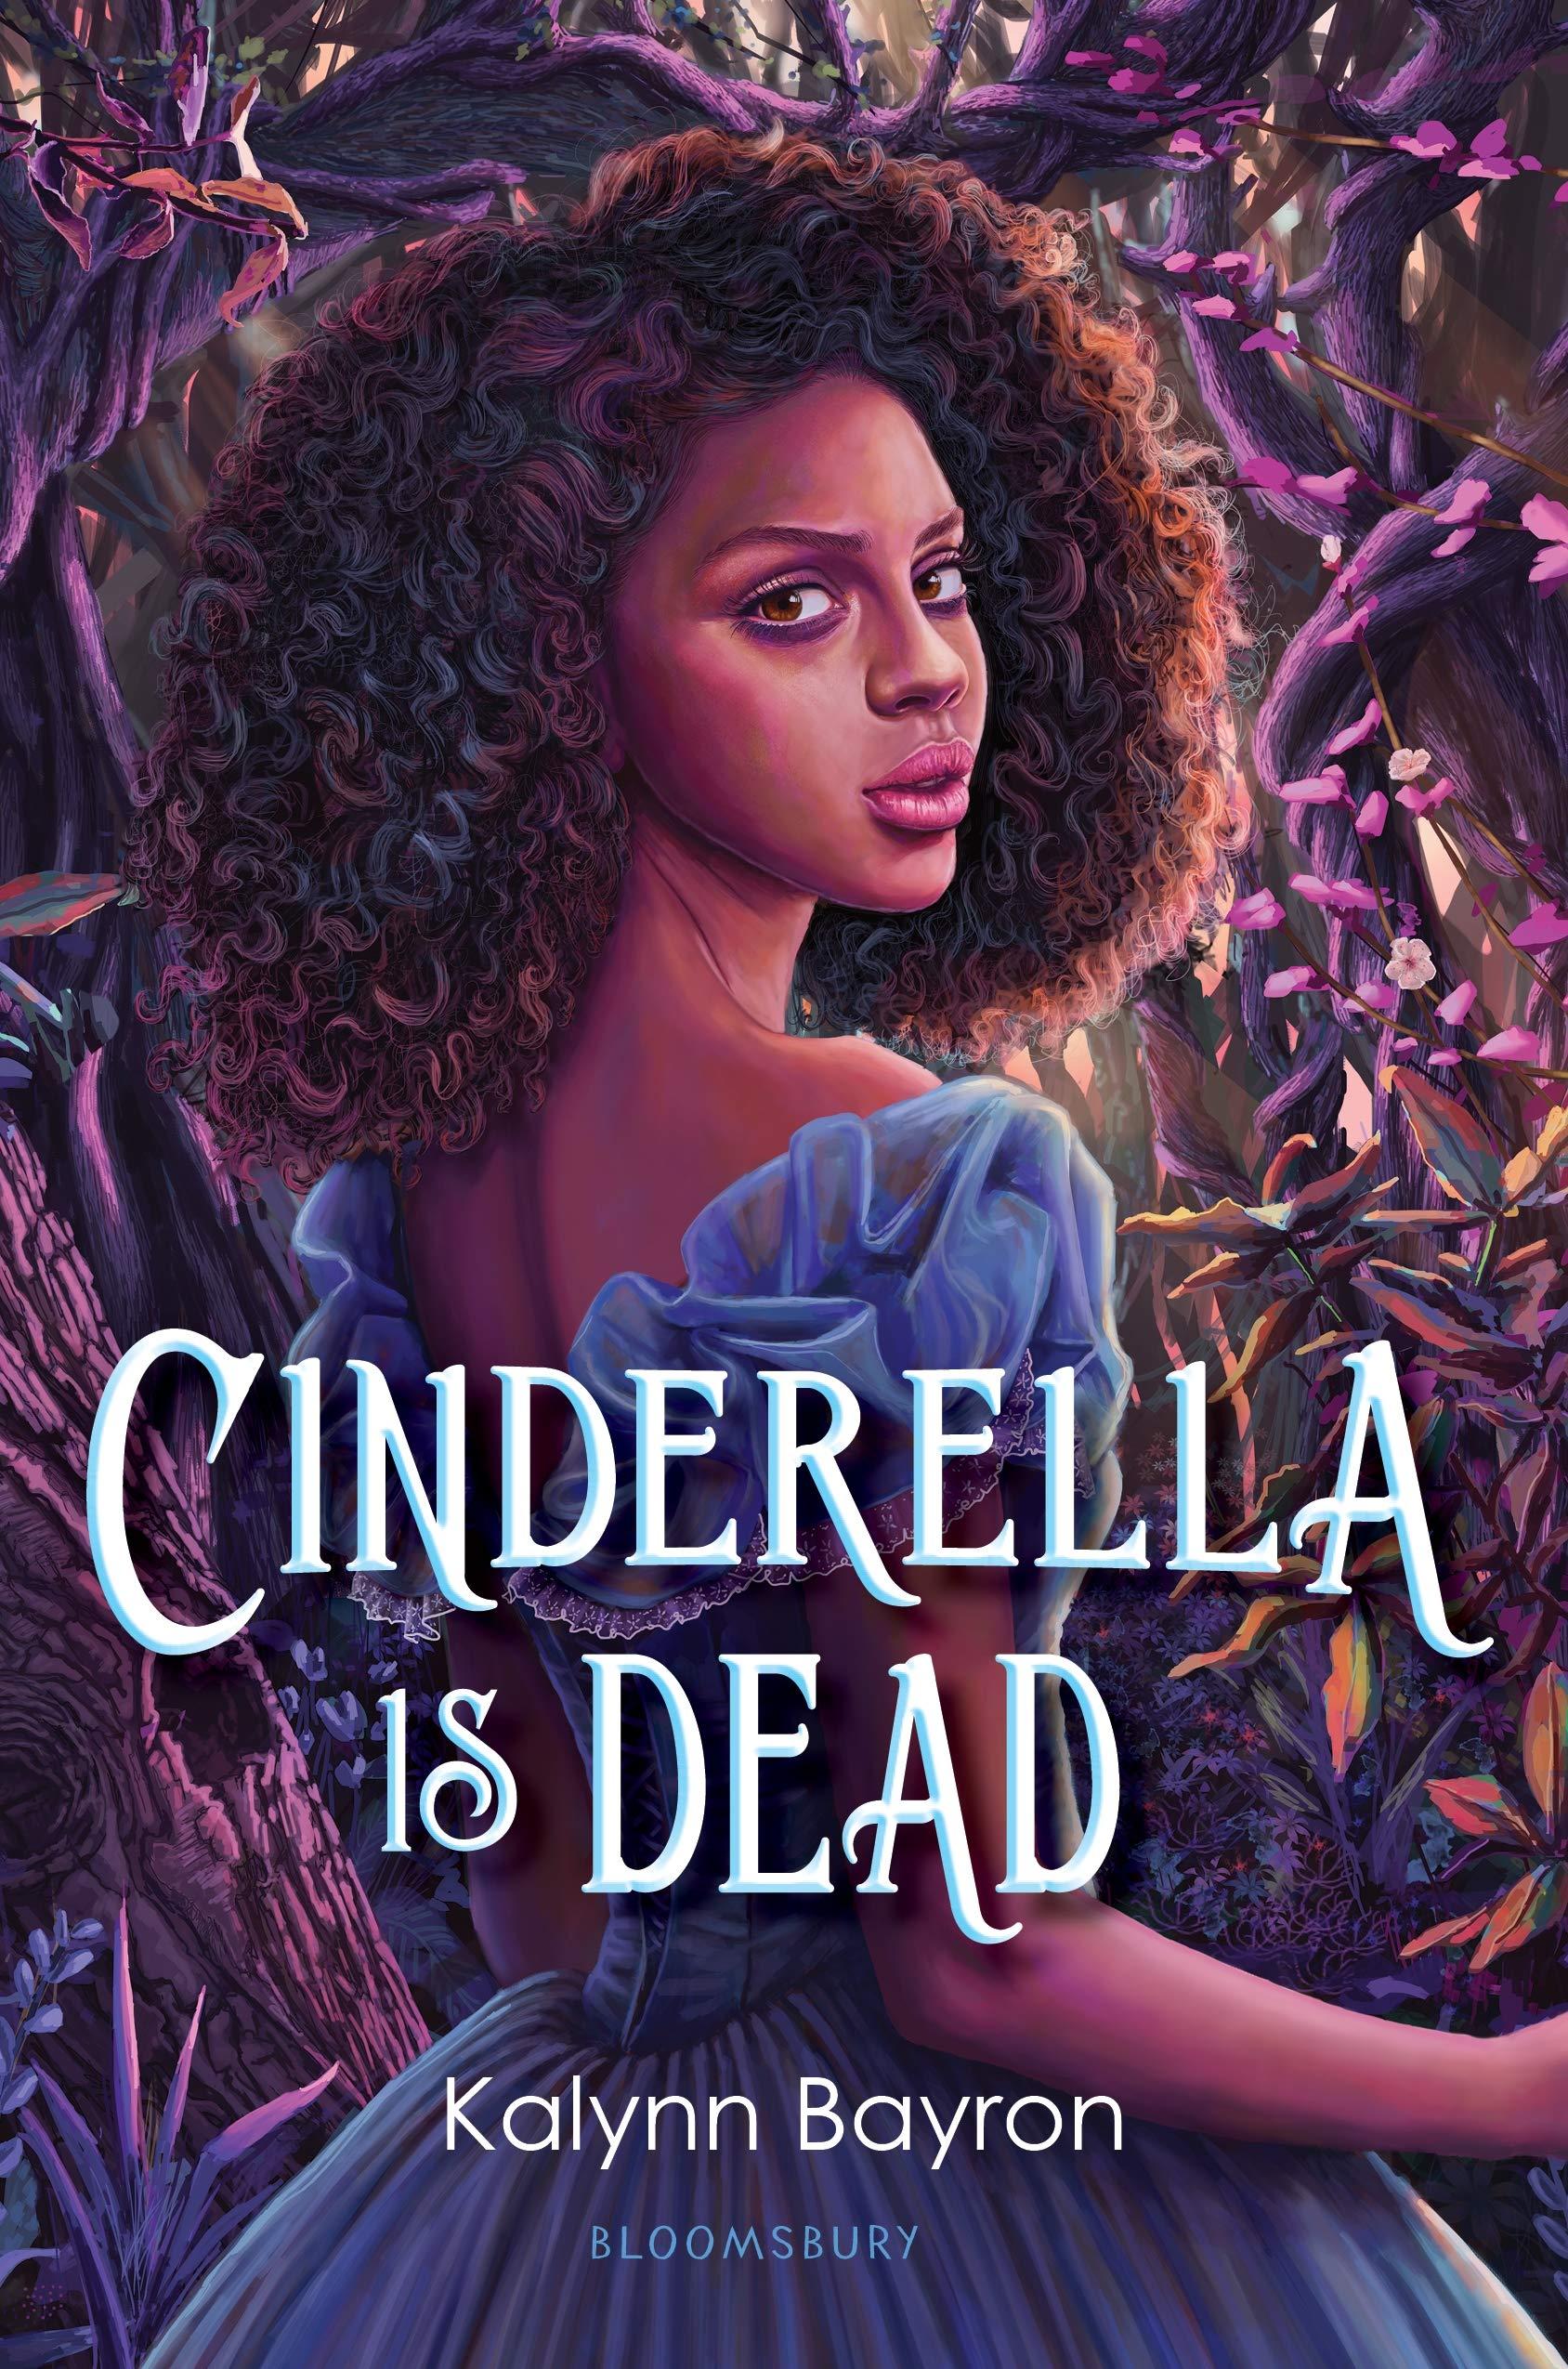 Amazon.com: Cinderella Is Dead (9781547603879): Bayron, Kalynn: Books